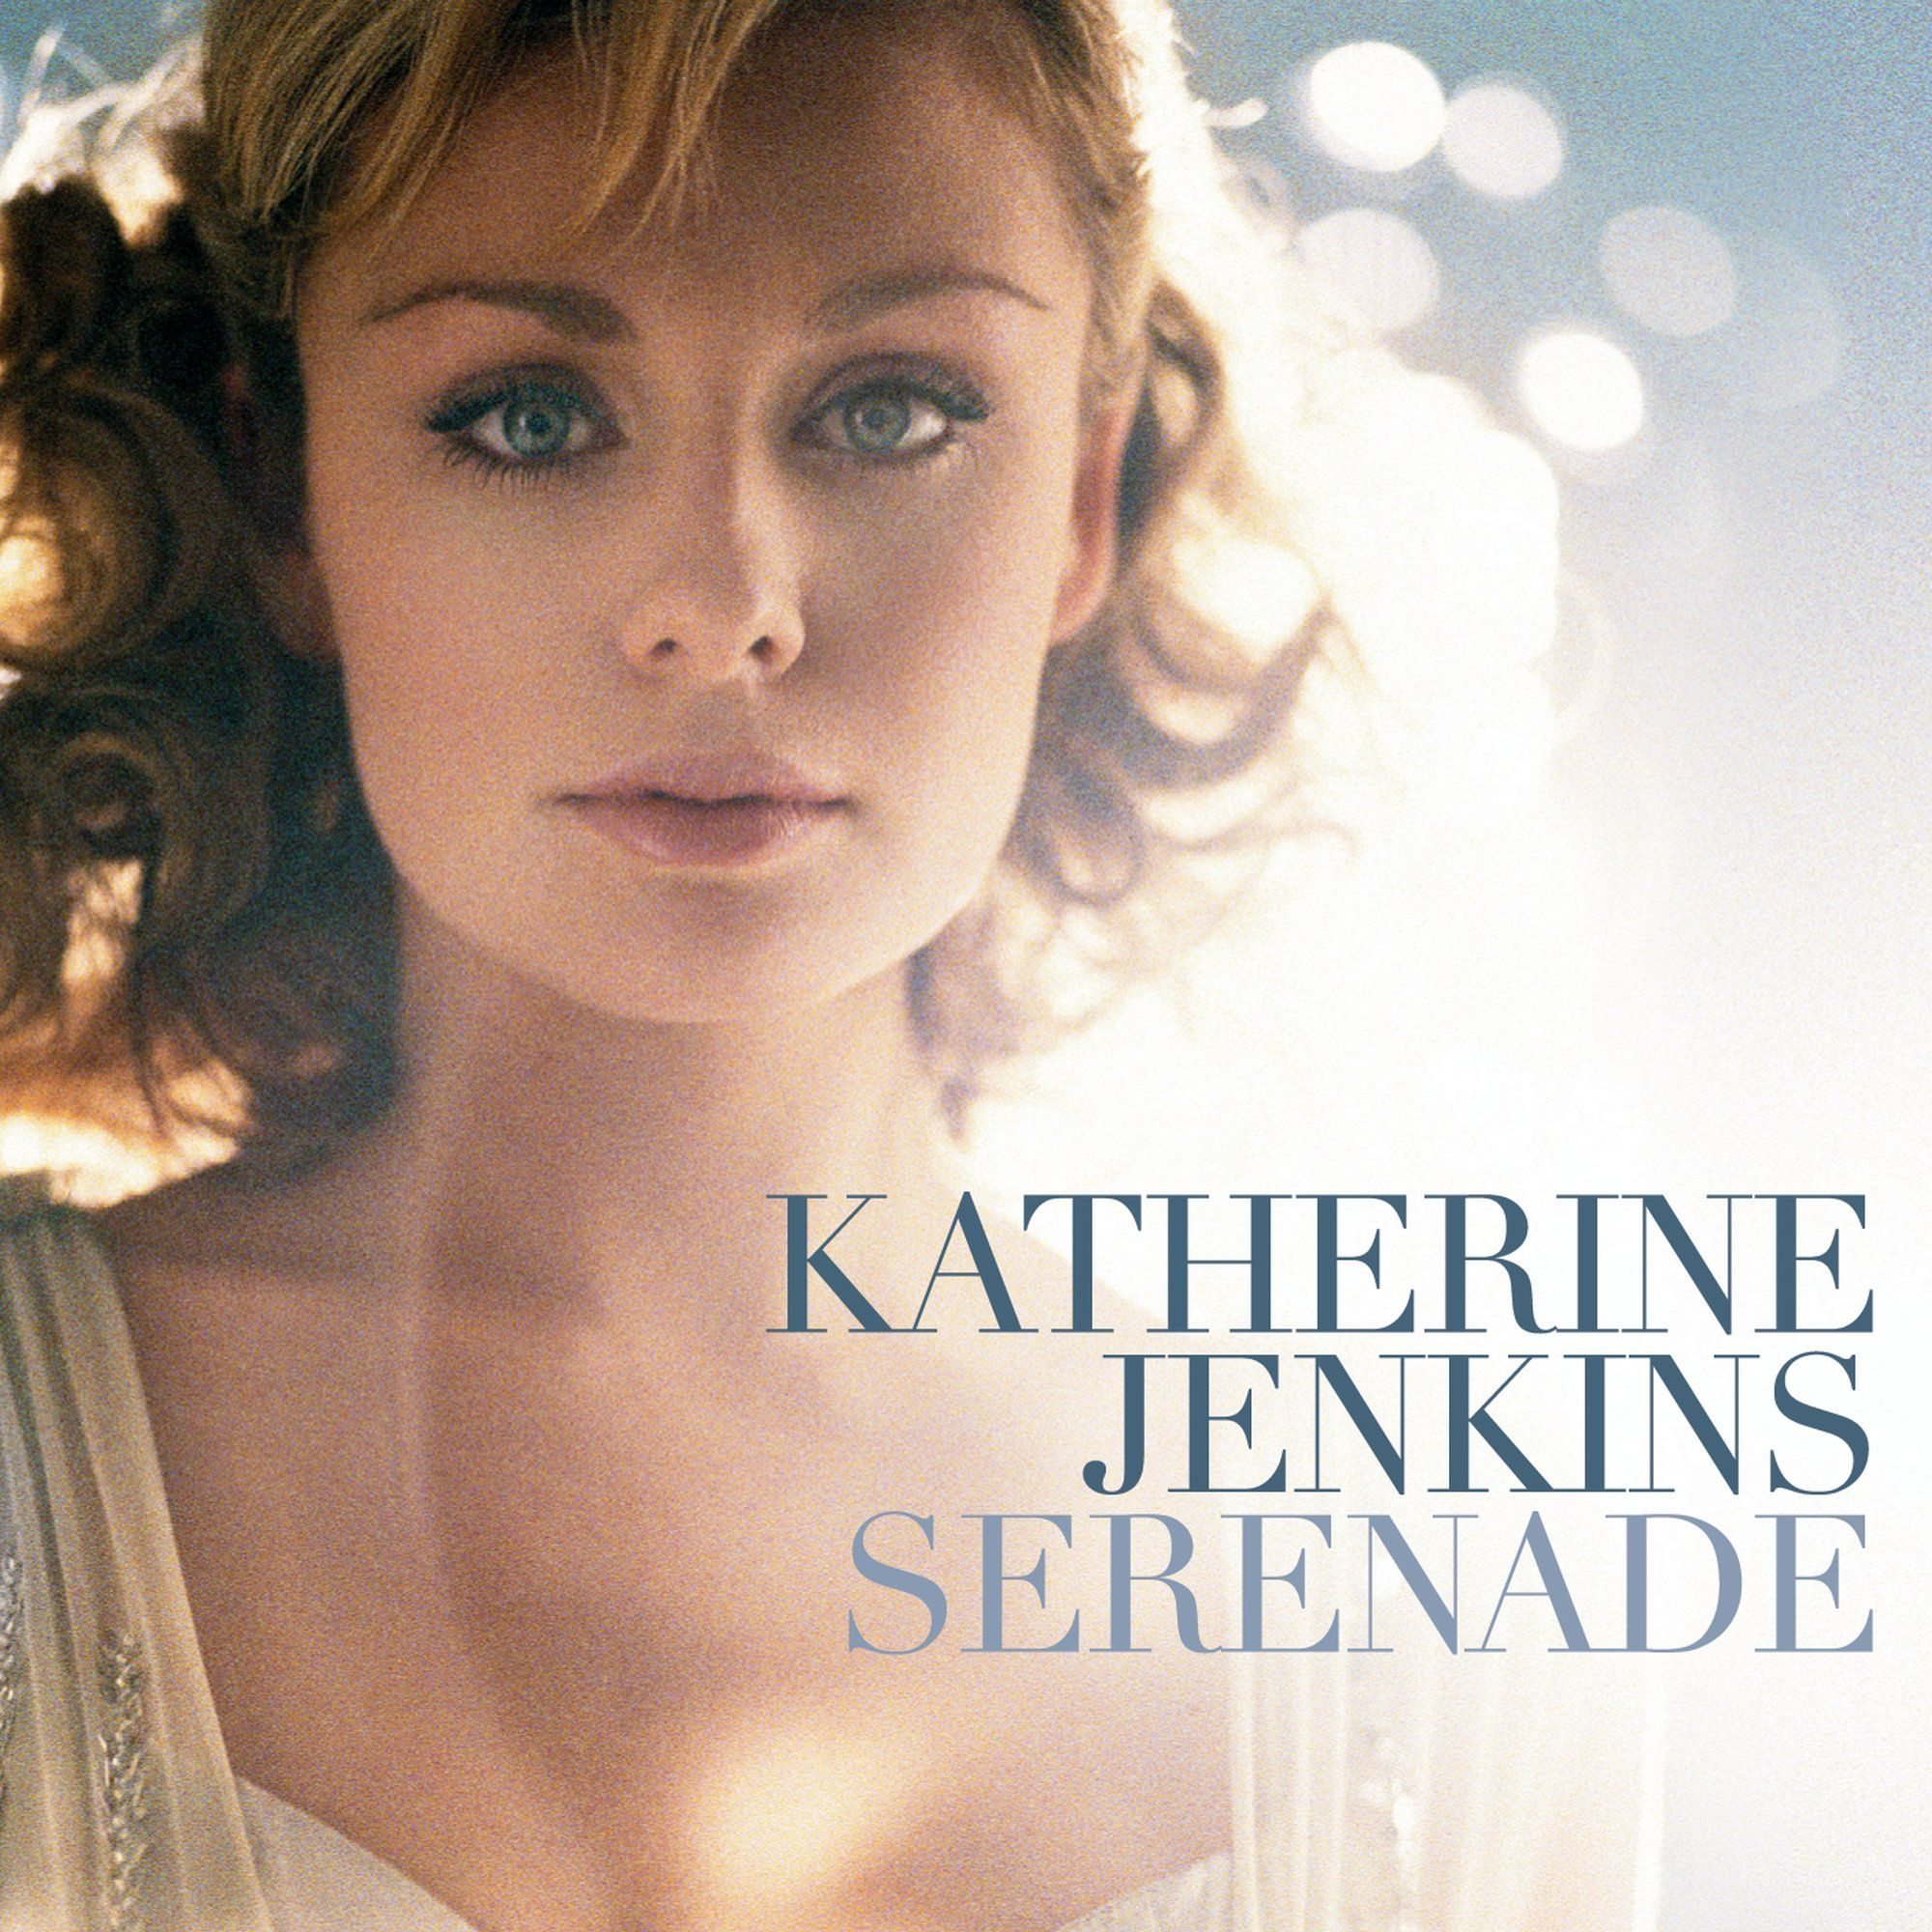 Katherine Jenkins - Serenade album cover